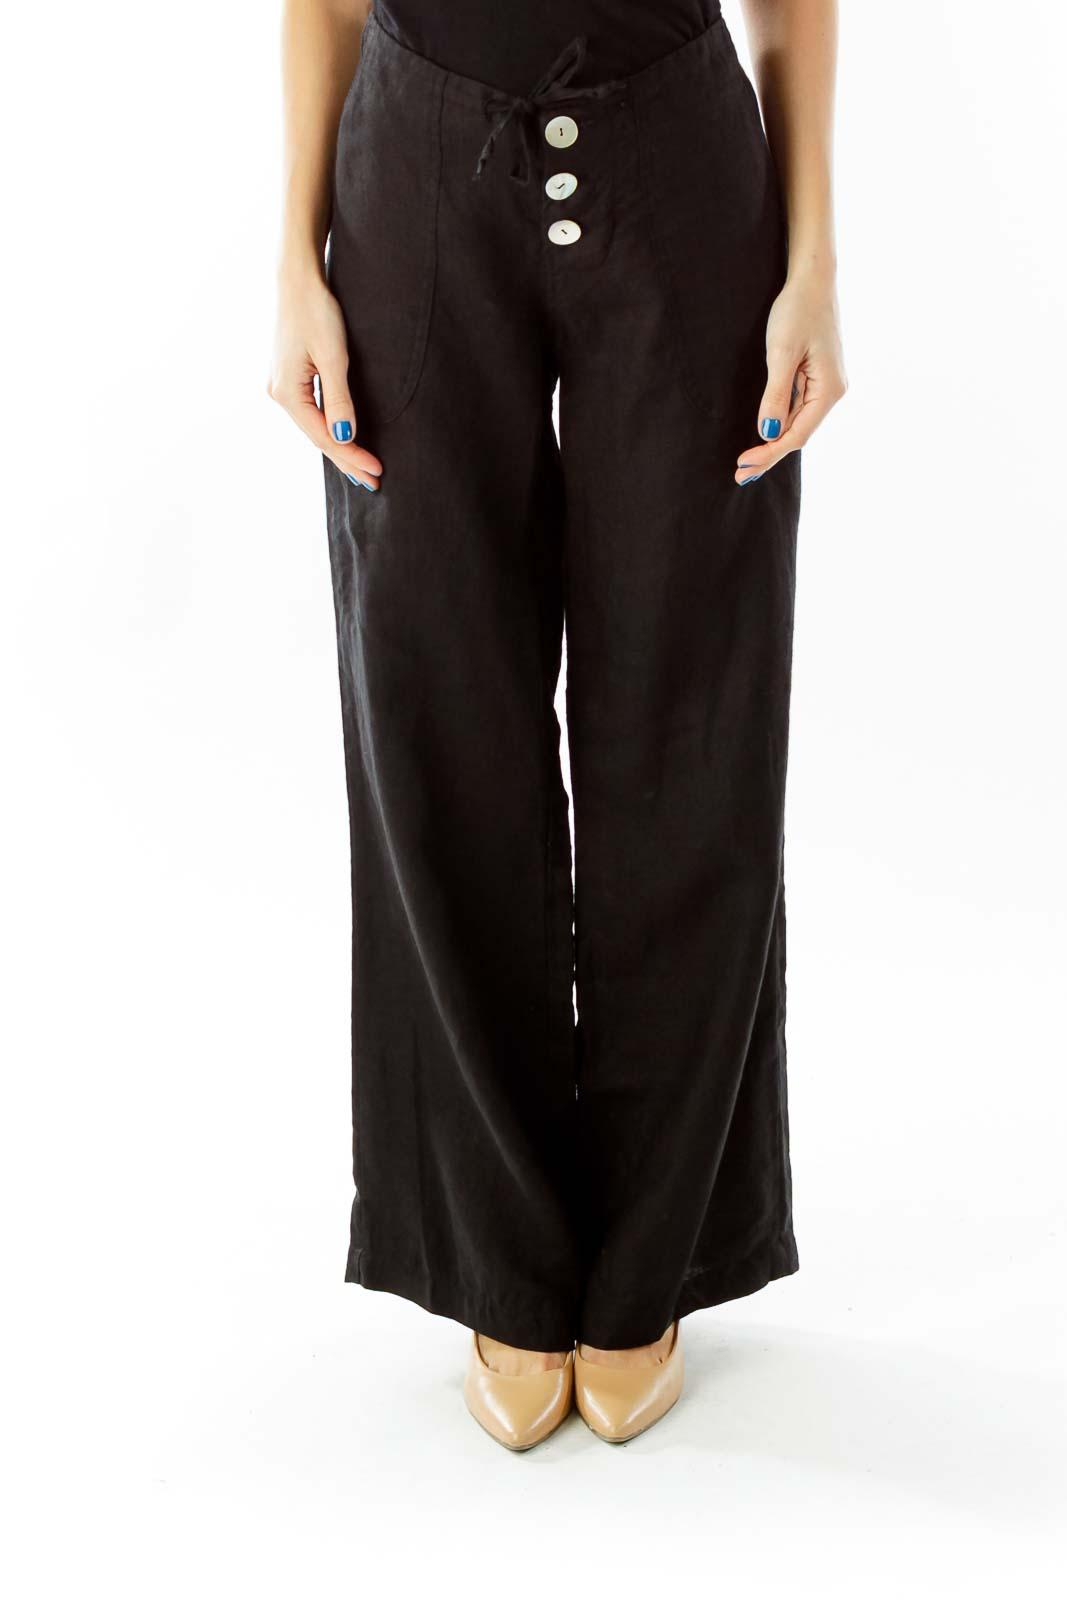 Black Button Fly Linen High-Waisted Wide-Leg Pants Front